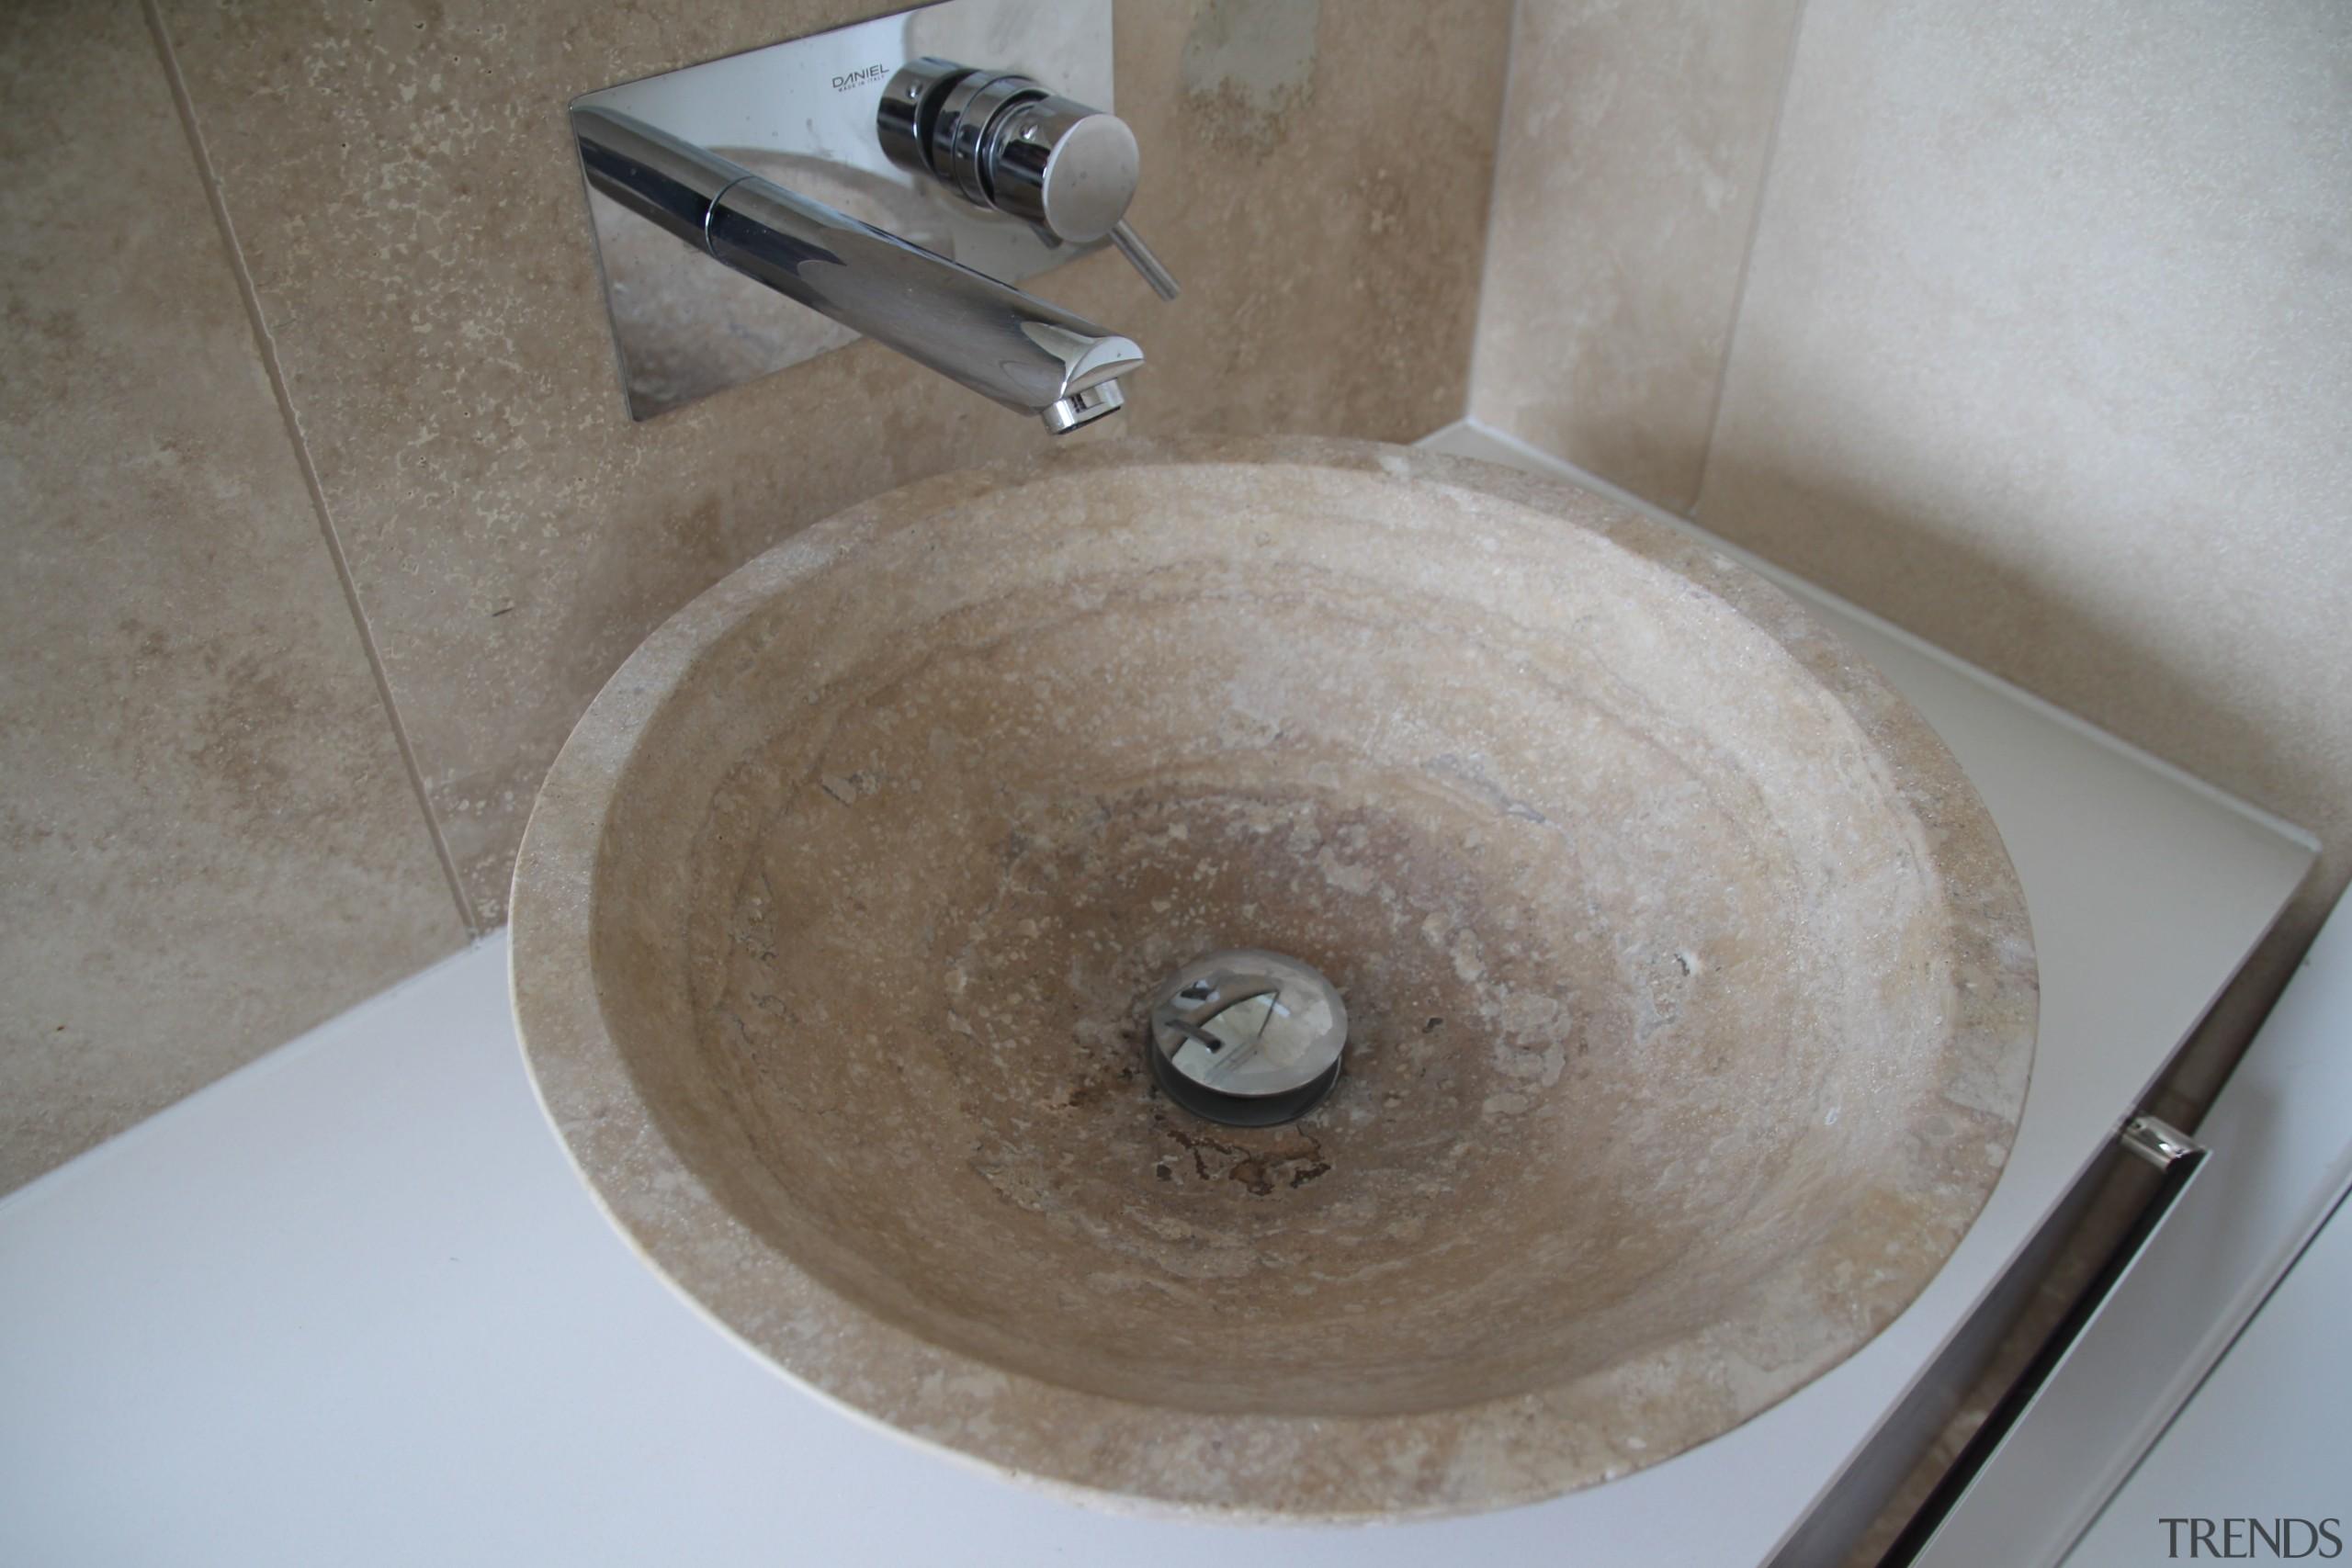 The table-top vanity basin in this bathroom is bathroom sink, plumbing fixture, sink, gray